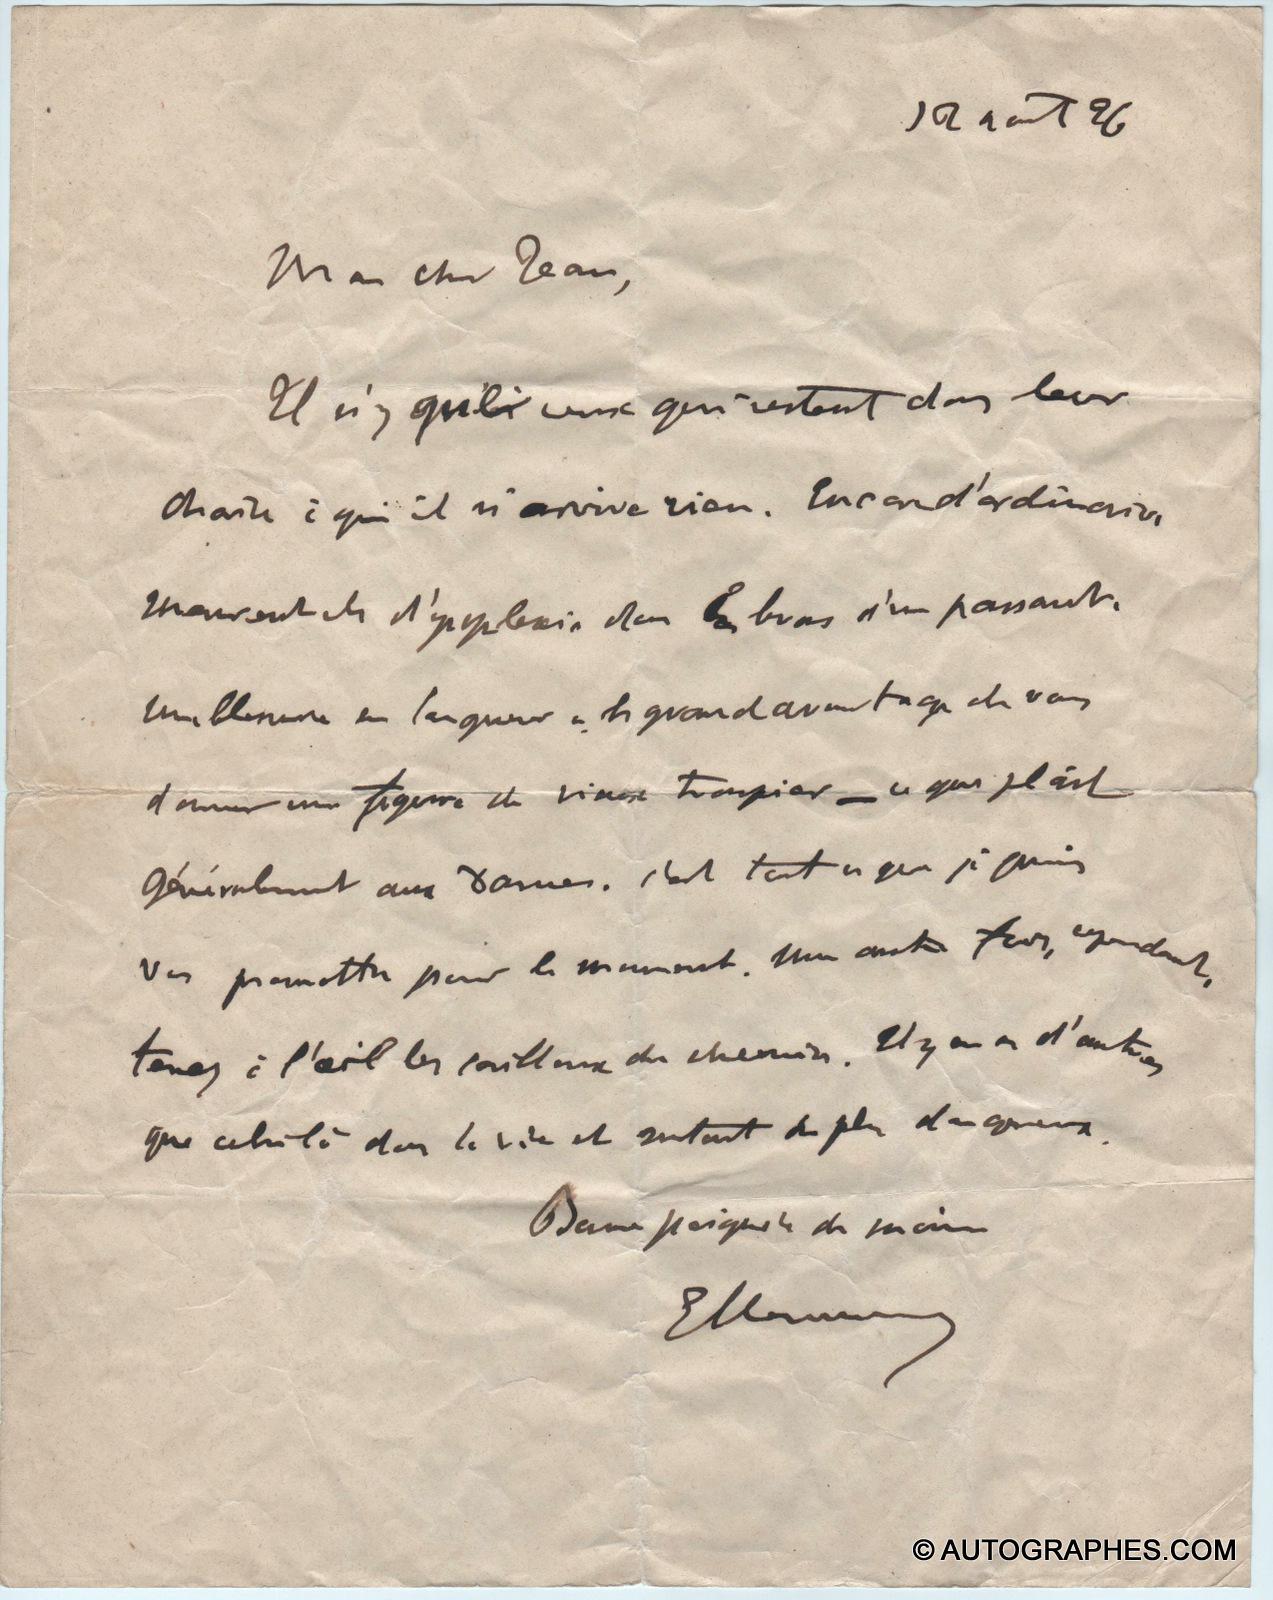 lettre-autographe-signee-georges-clemenceau-a-jean-baldensperger-1926